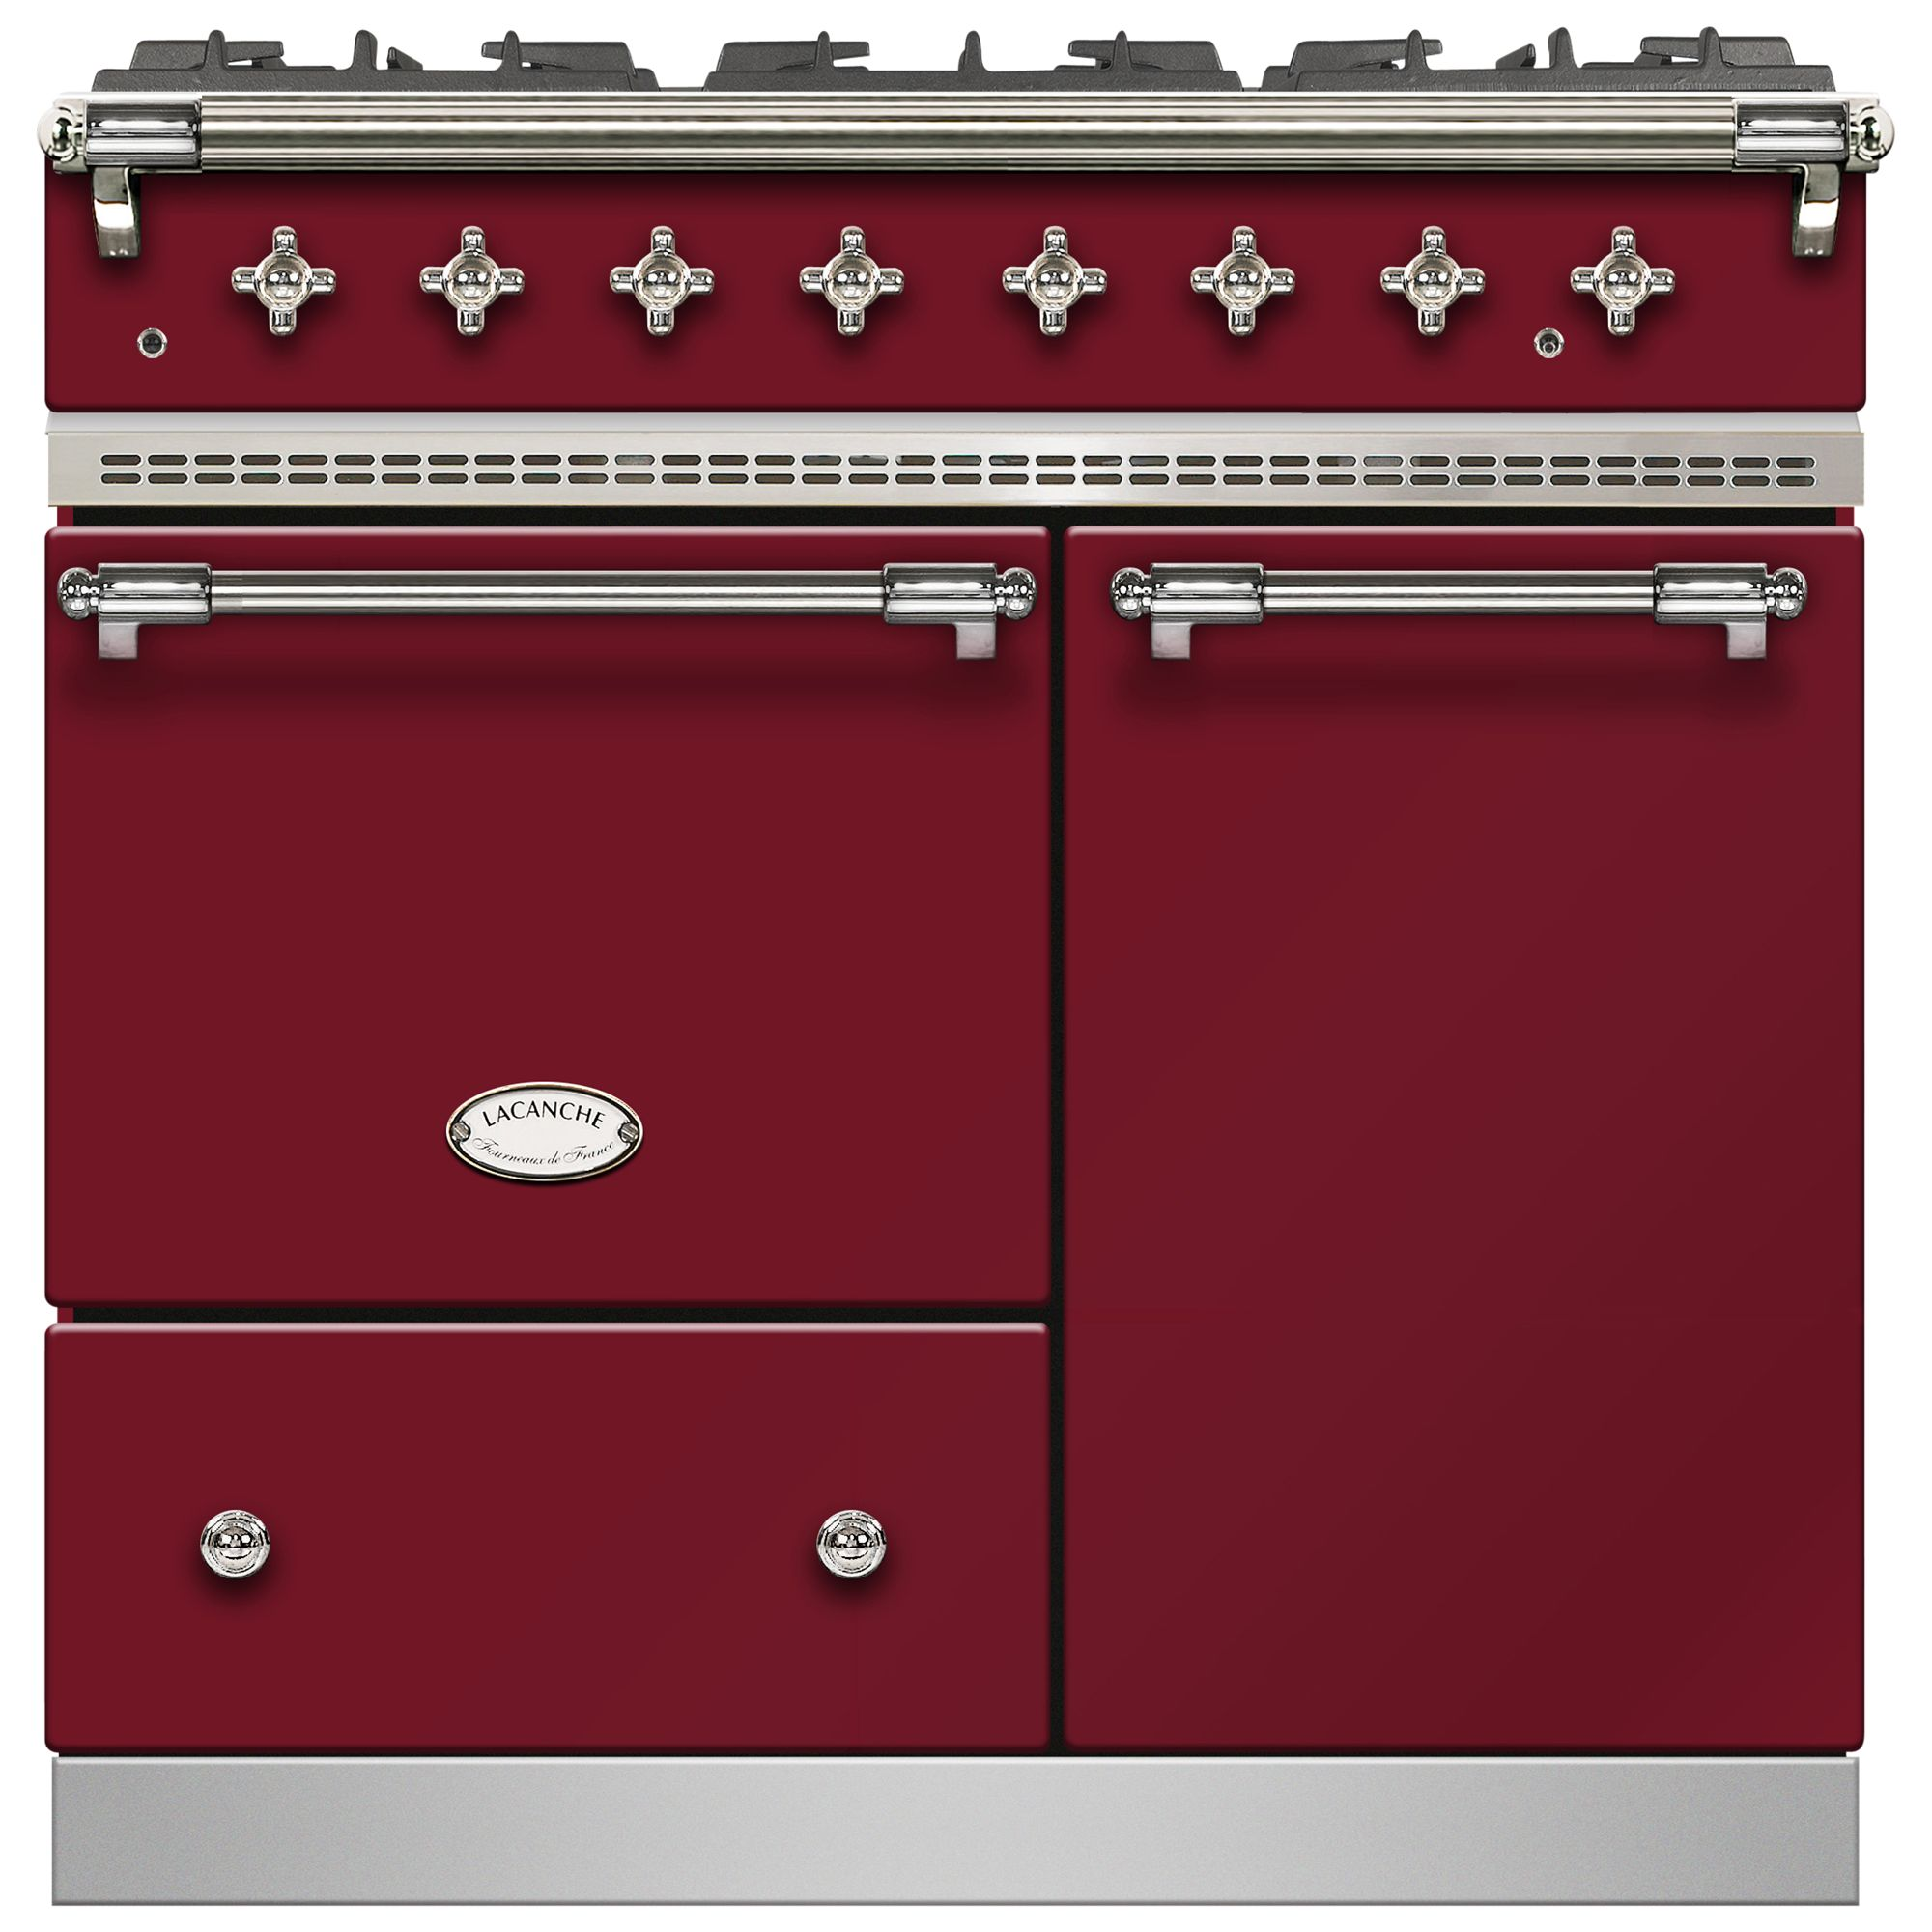 Lacanche Lacanche Beaune LG962GCTDRBCHA Dual Fuel Range Cooker, Burgundy Red / Chrome Trim